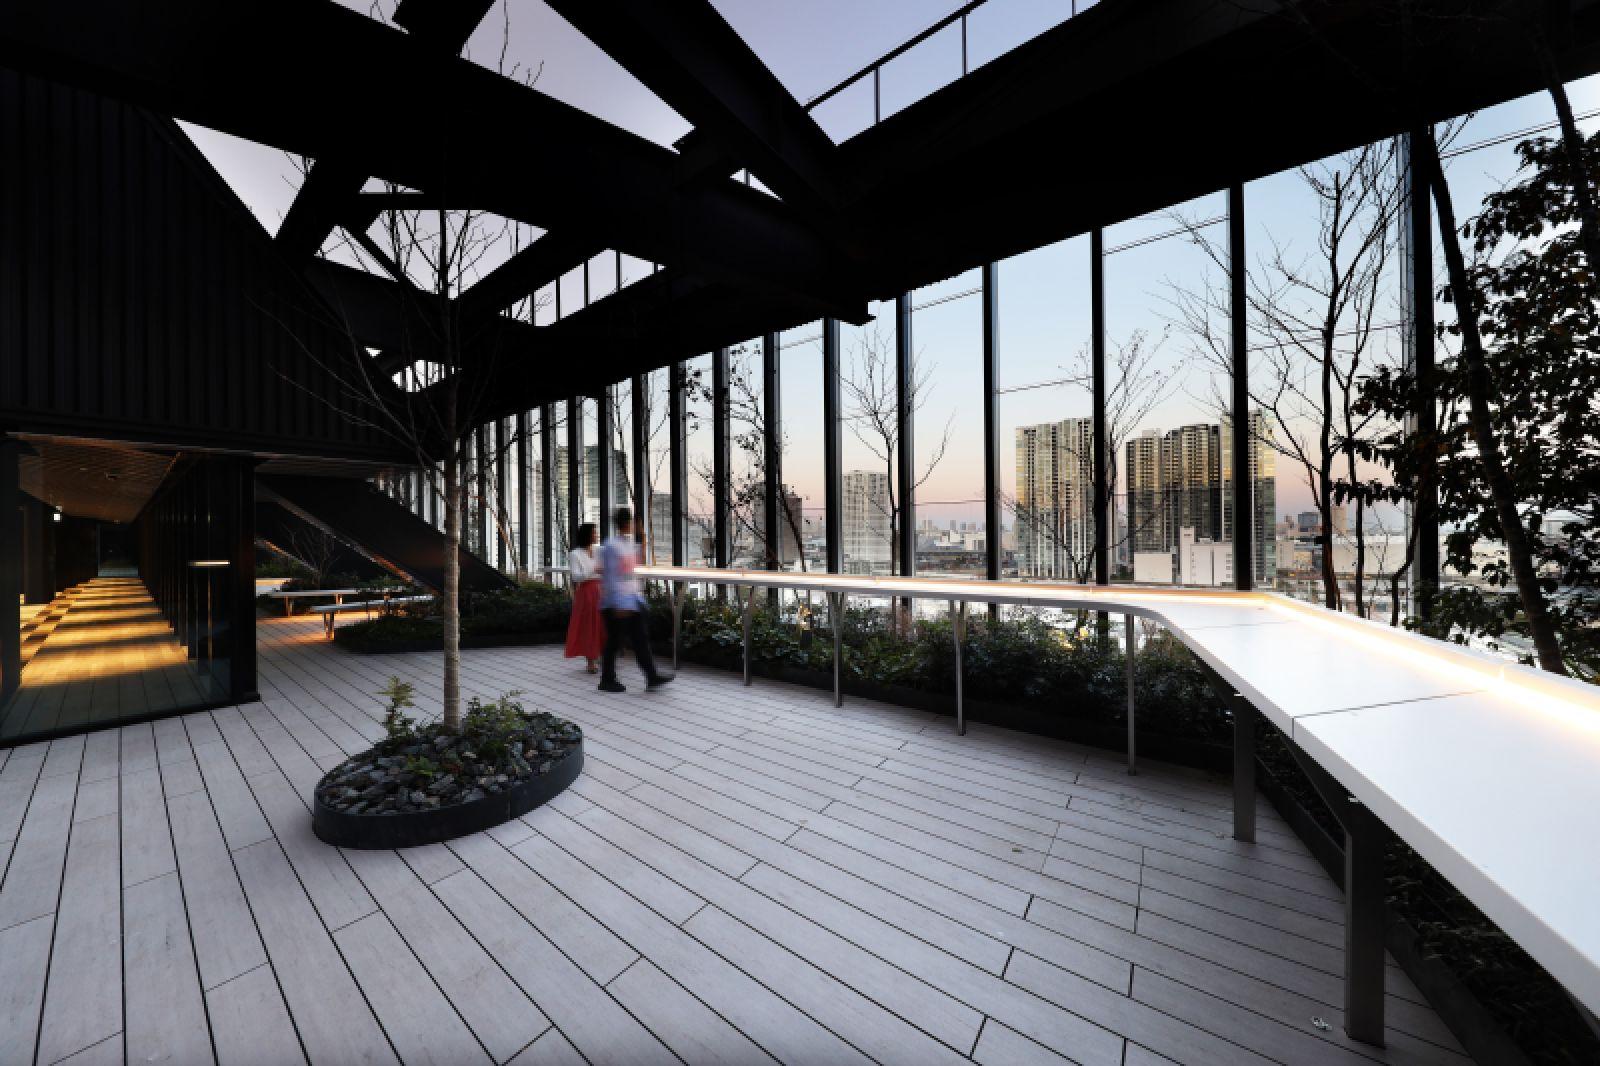 Yamato Konan Building